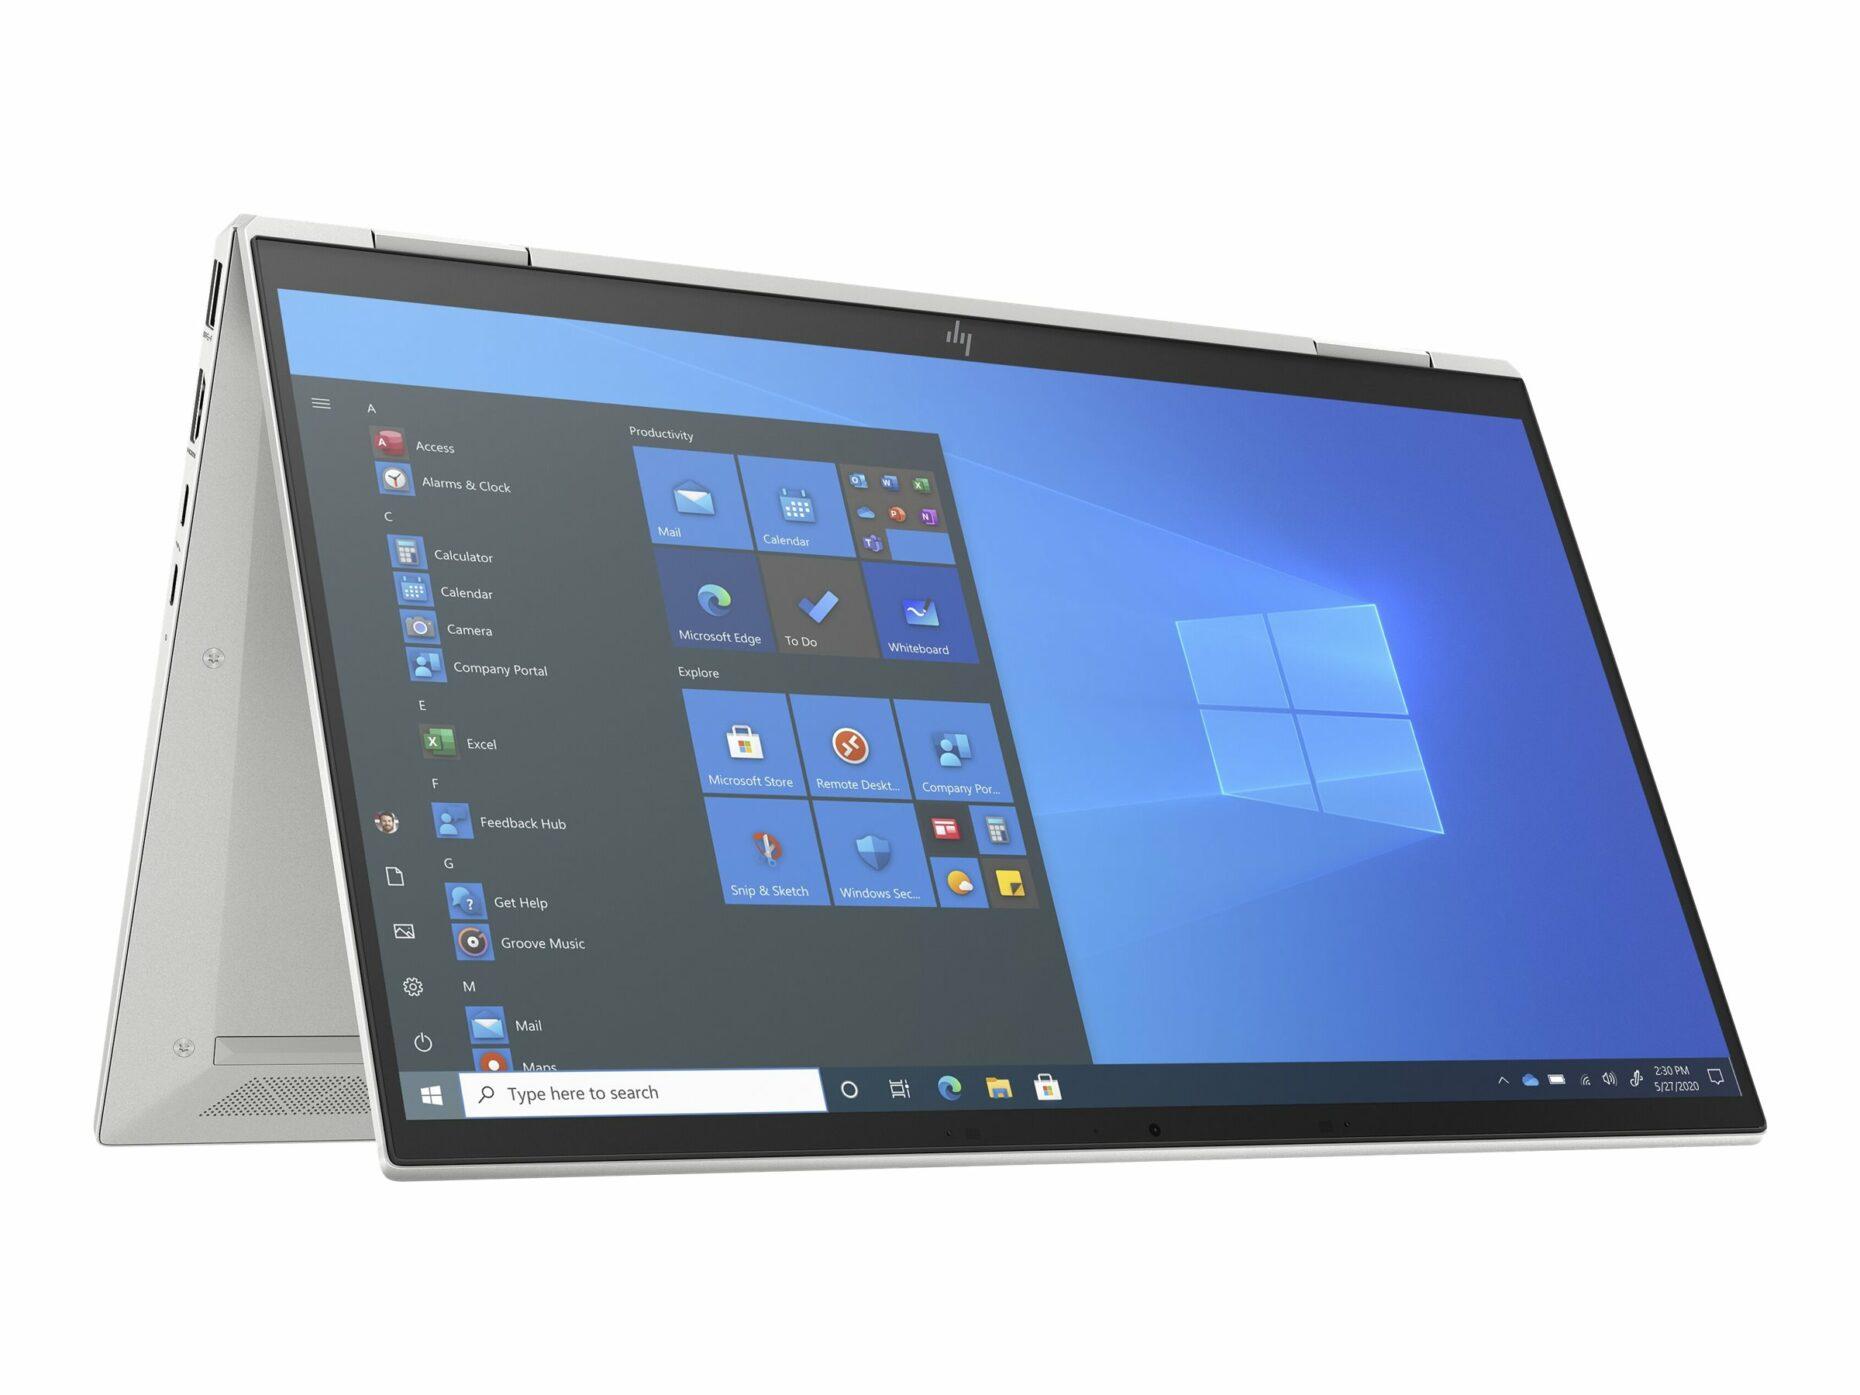 "HP EliteBook 1030 G8 - Flip design - Core i5 1135G7 - Smart Buy - 16 GB RAM - 256 GB SSD - 13.3"" touchscreen (Full HD) - Notebook"